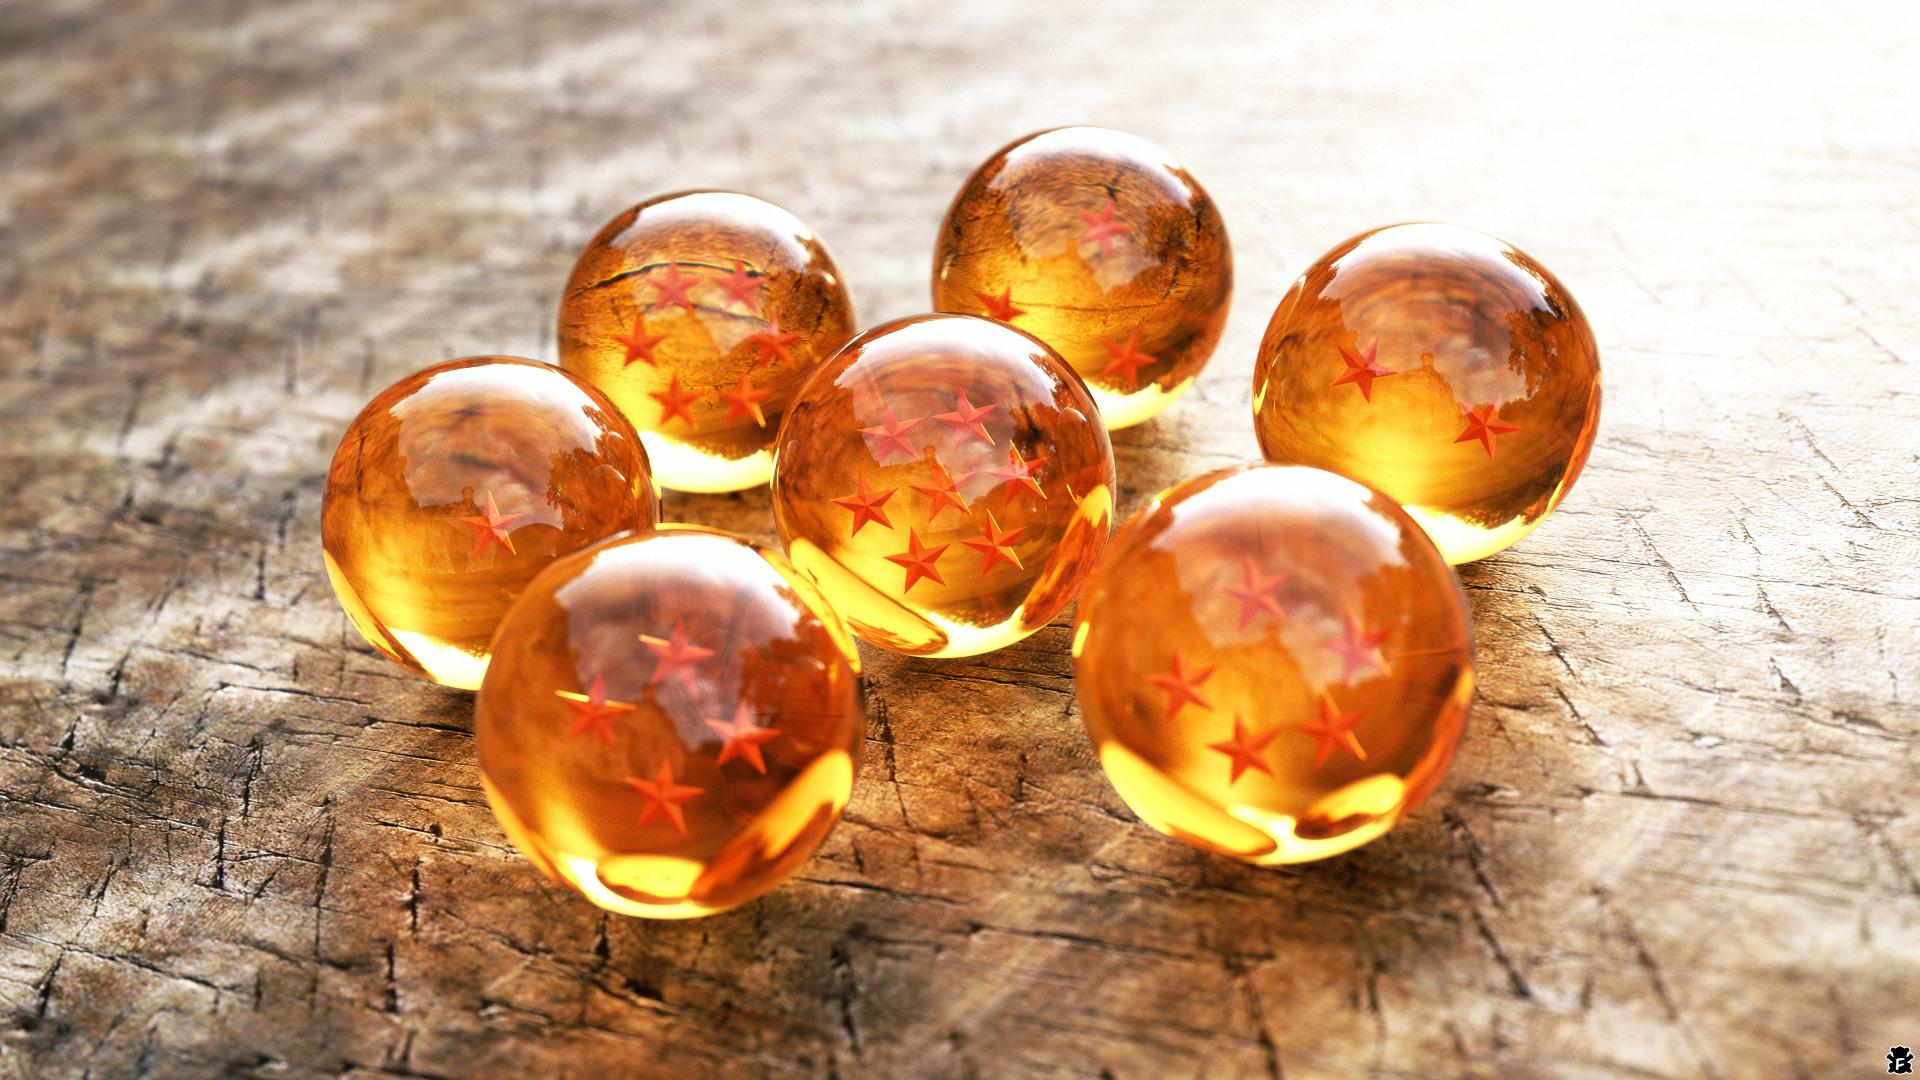 Dragonballs by Furumaru